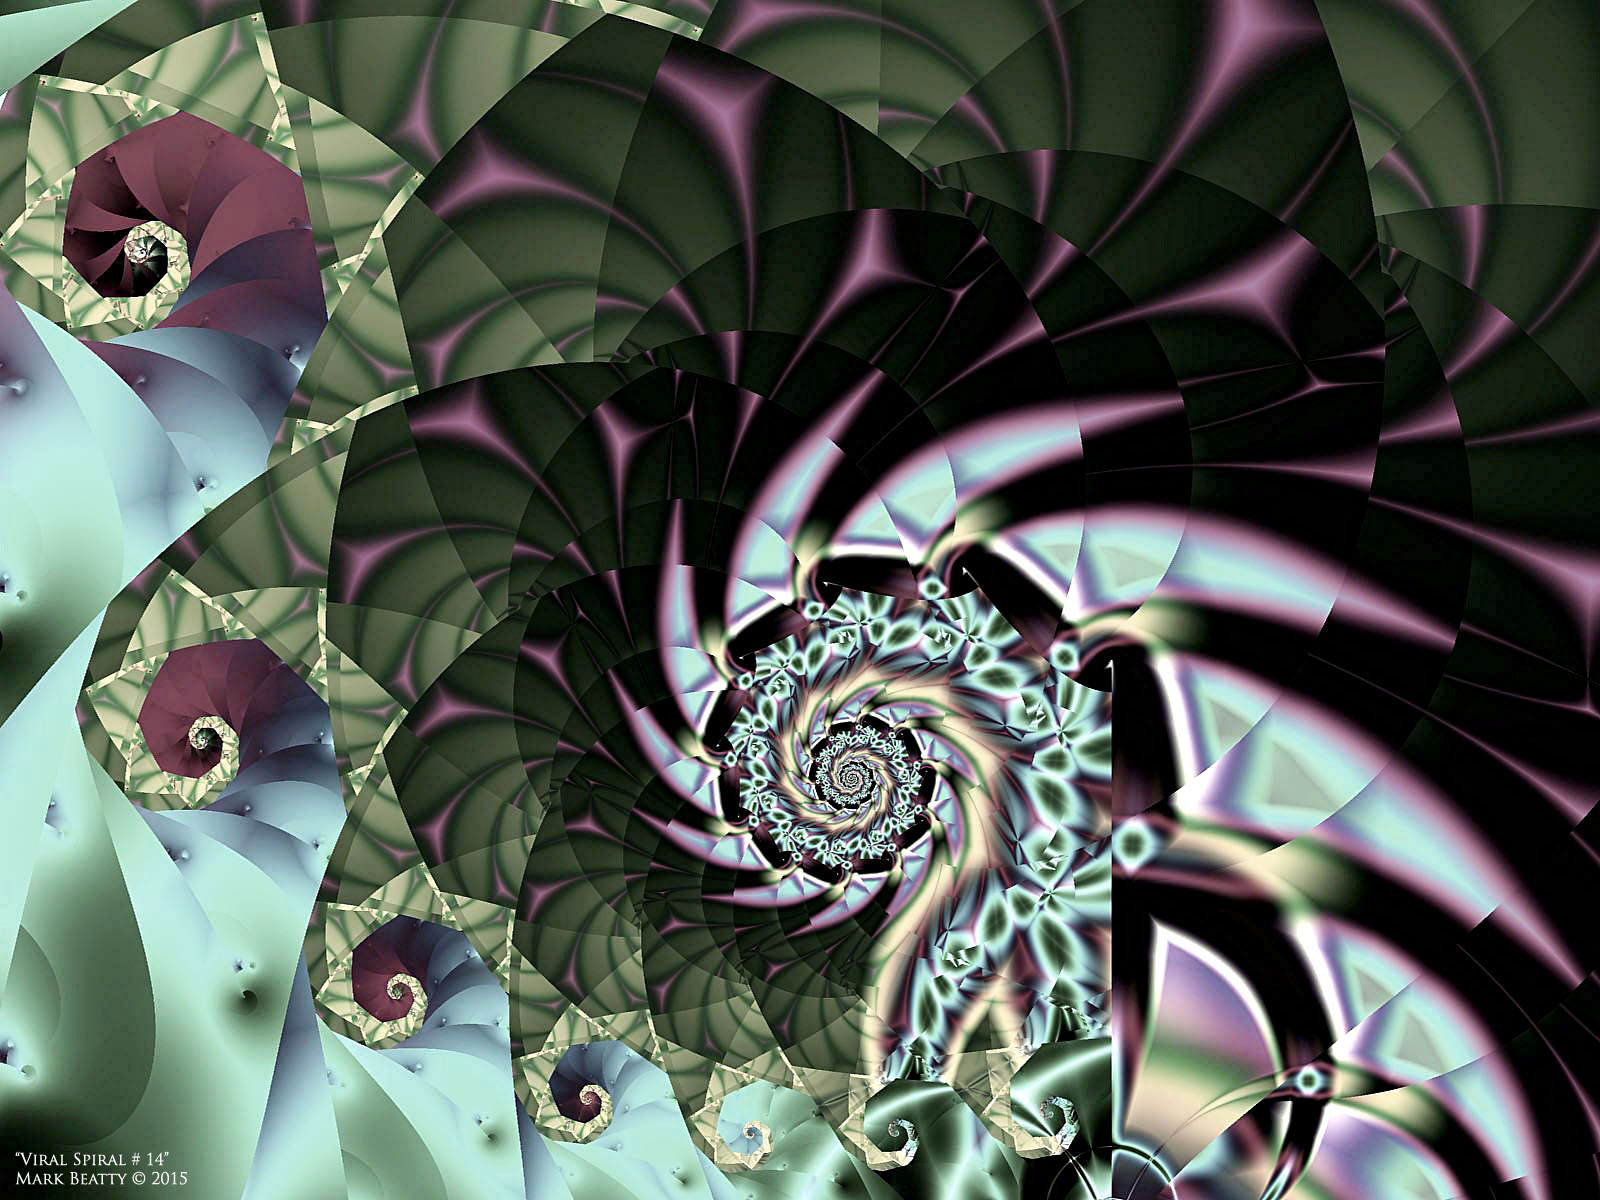 Viral Spiral # 14 by 2BORN02B